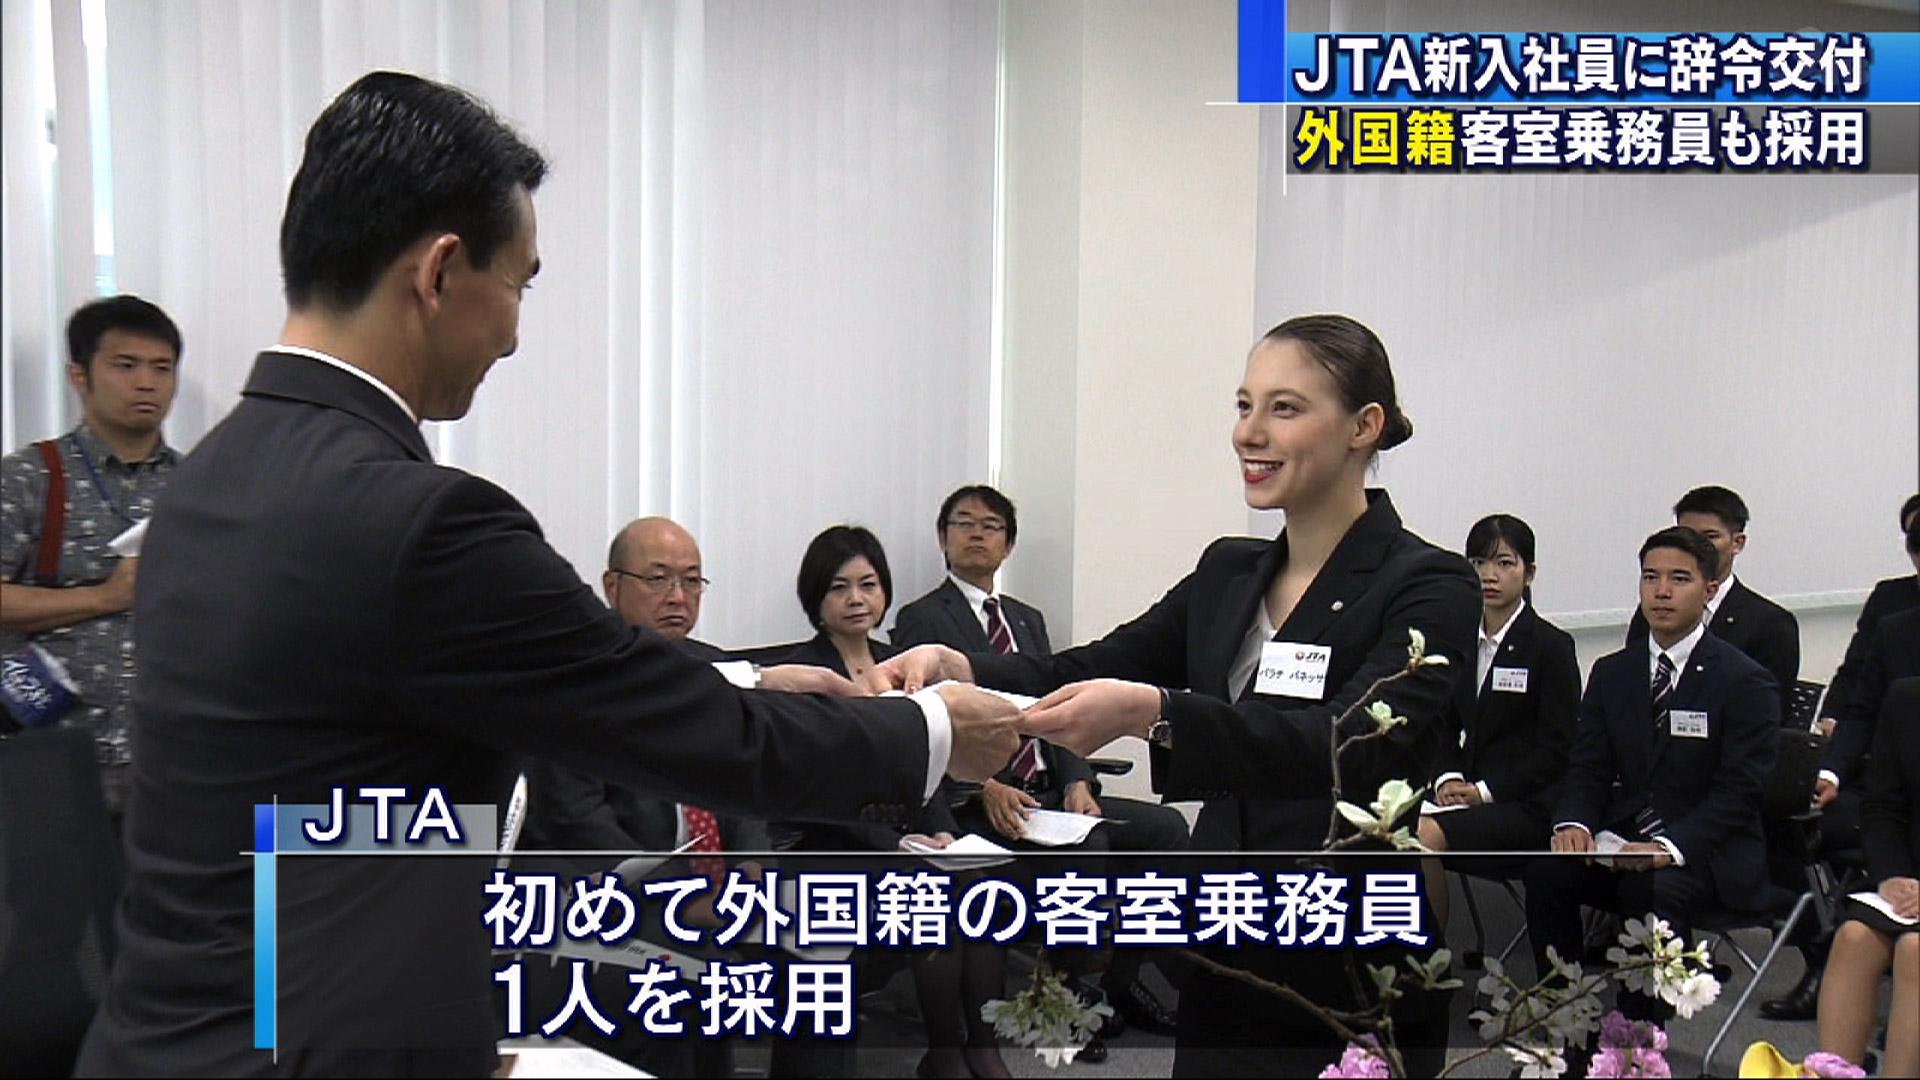 JTA新入社員に辞令交付